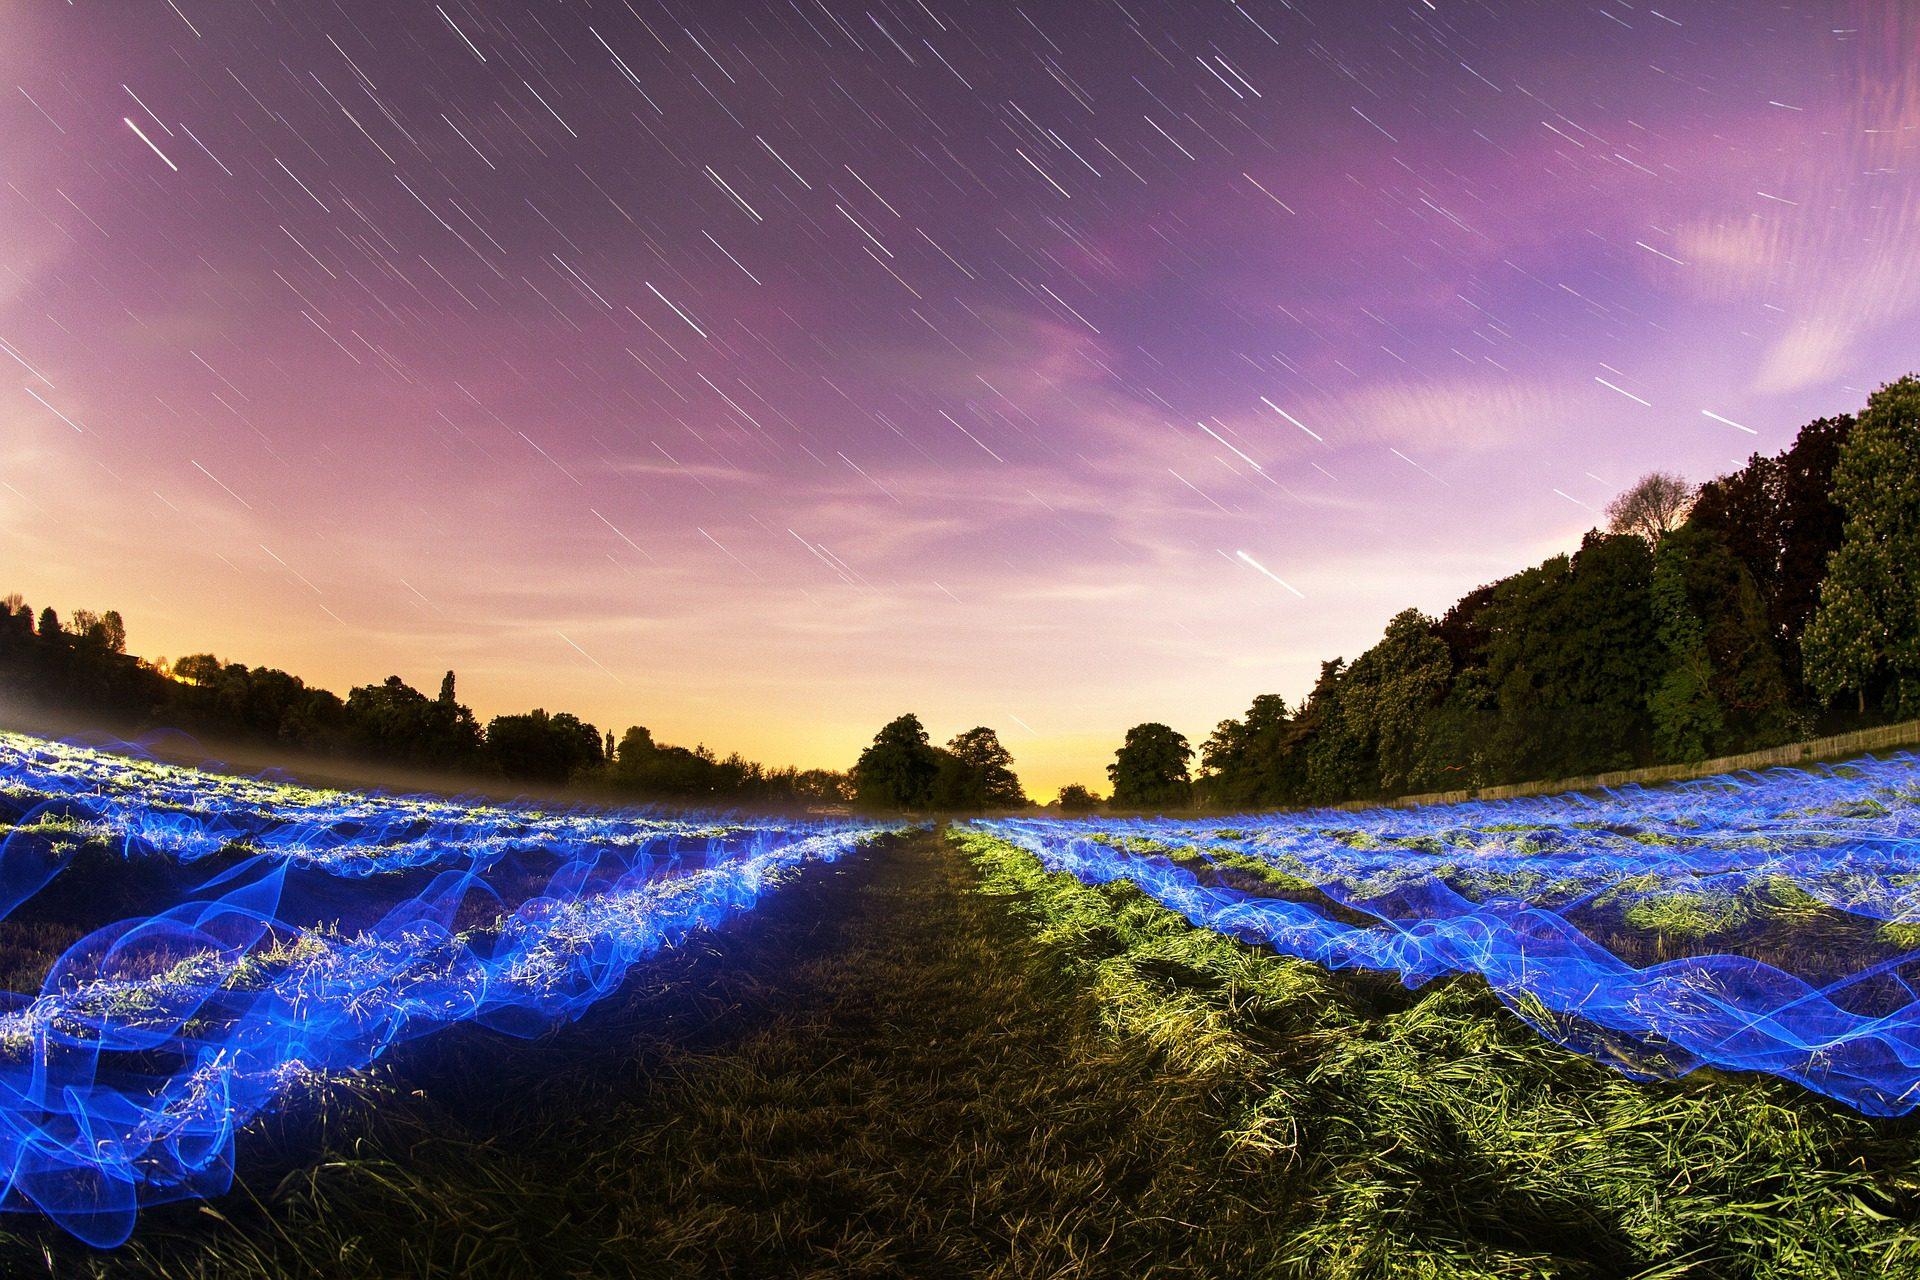 पेड़, आकाश, स्टार, रात, halos - HD वॉलपेपर - प्रोफेसर-falken.com